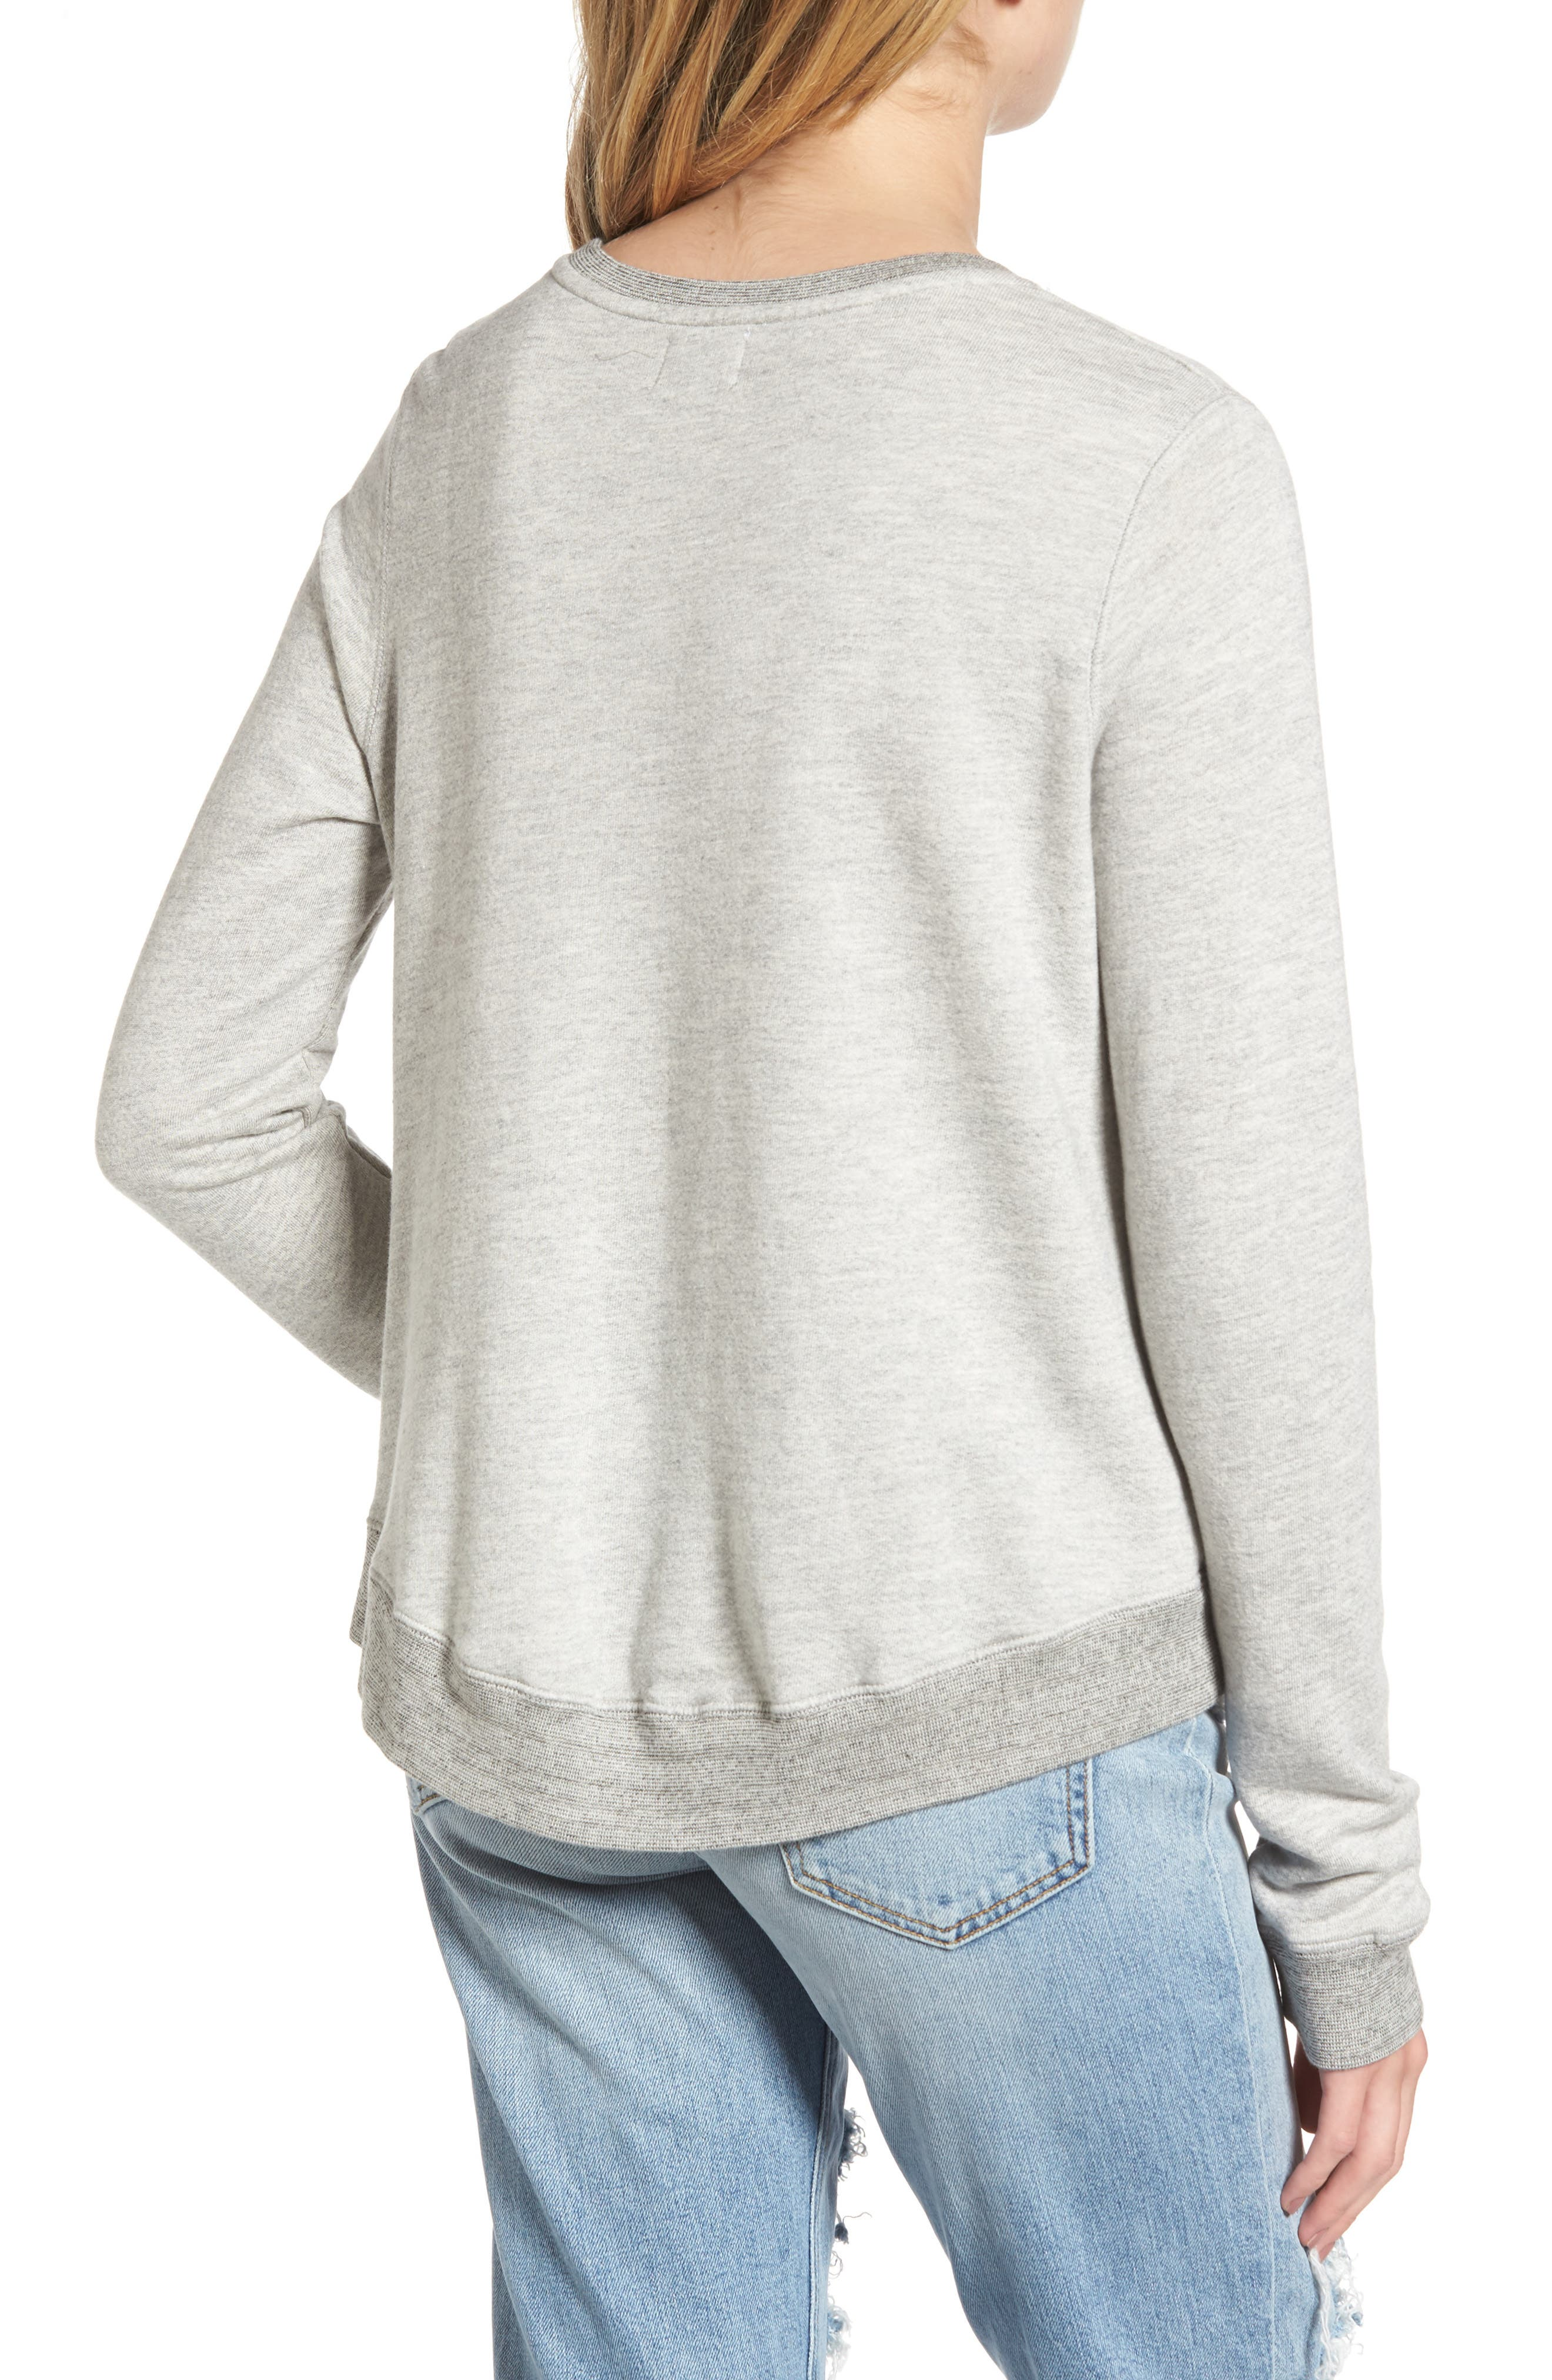 Love Sweatshirt,                             Alternate thumbnail 2, color,                             Heather Grey